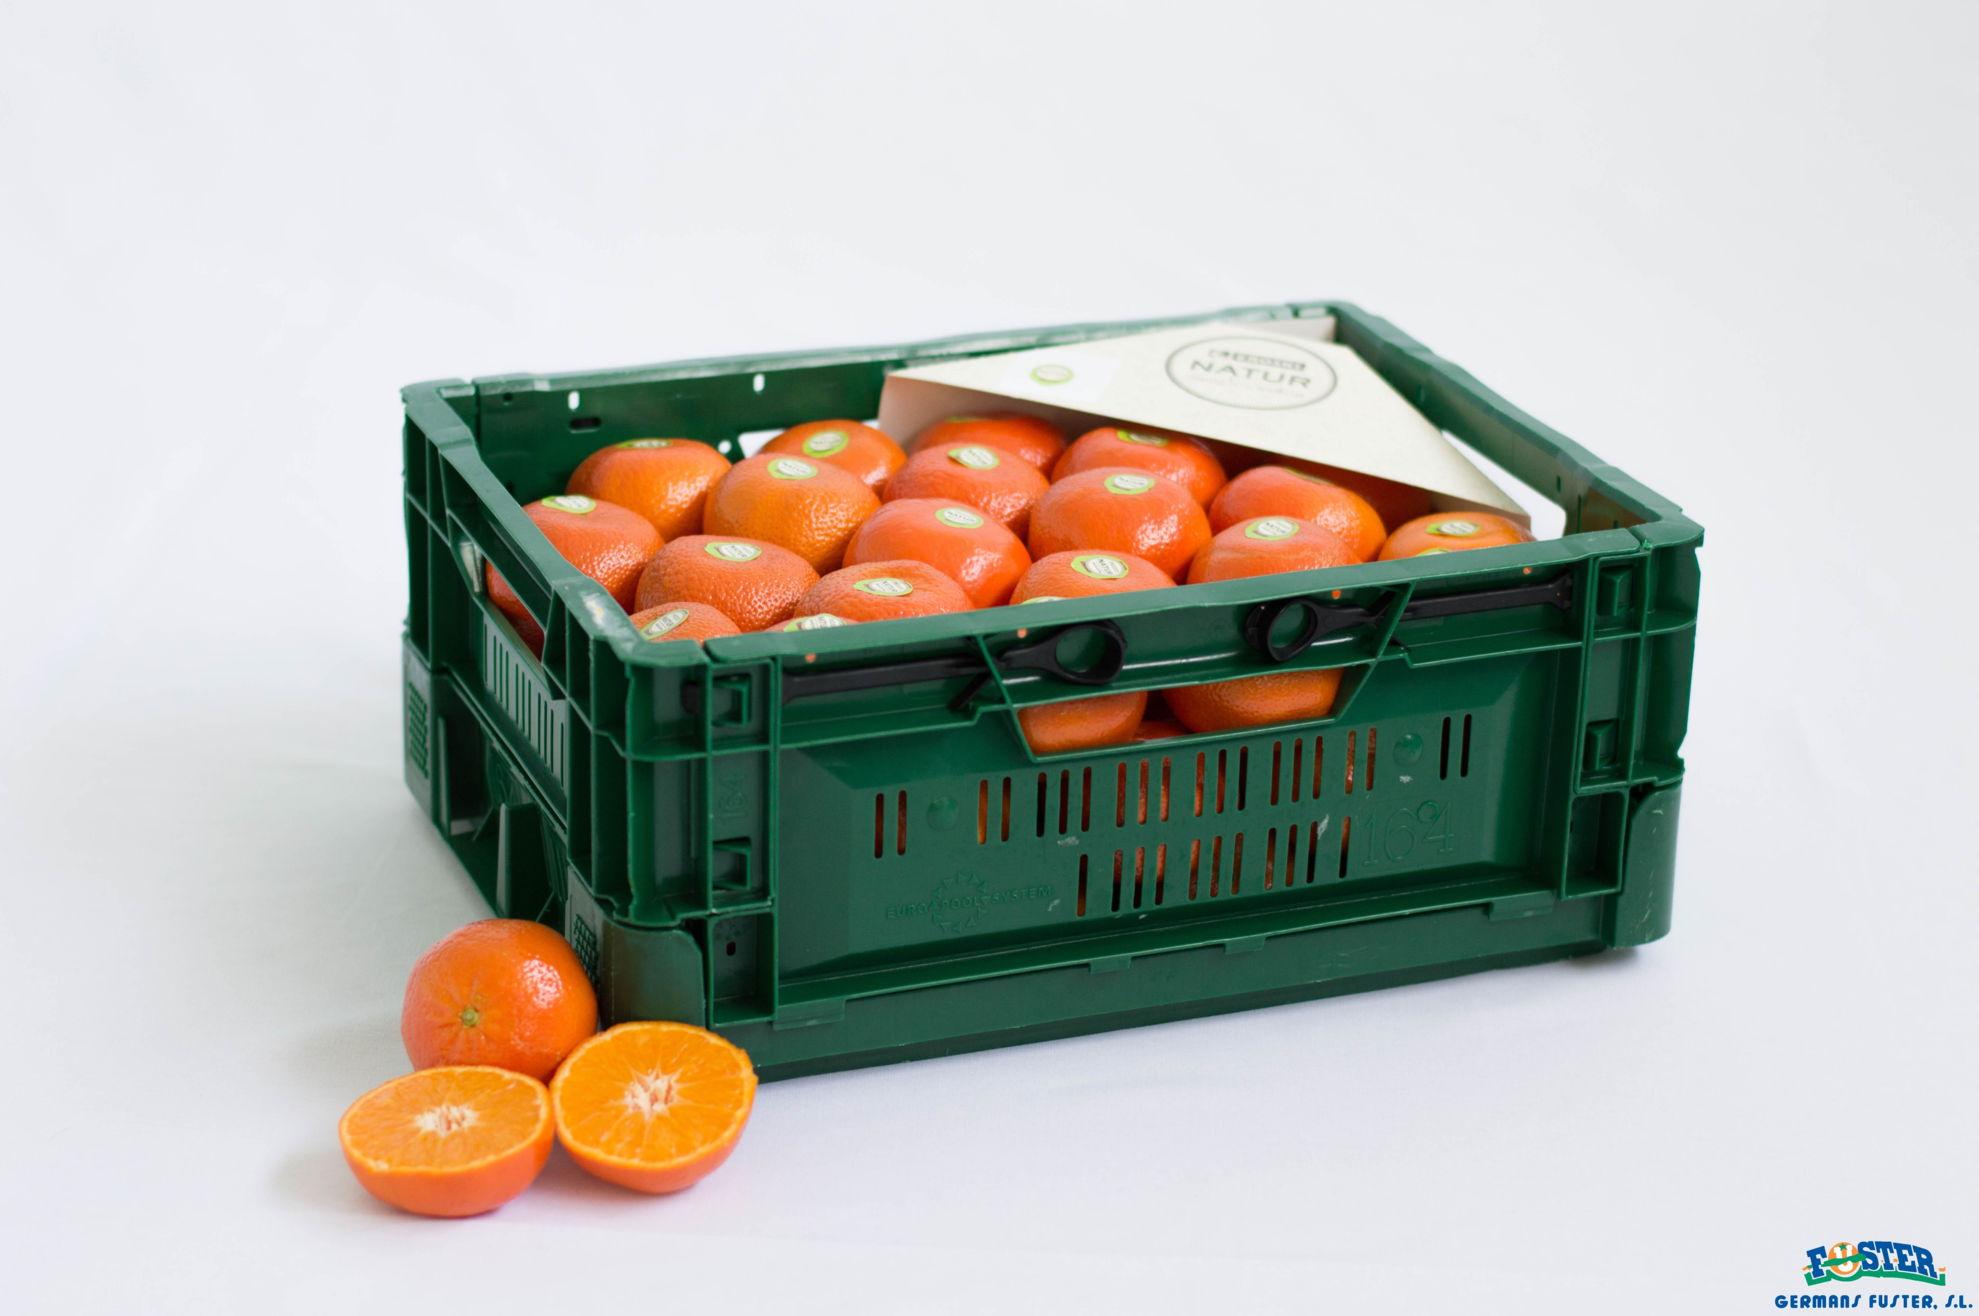 mandarina-natur-germansfuster